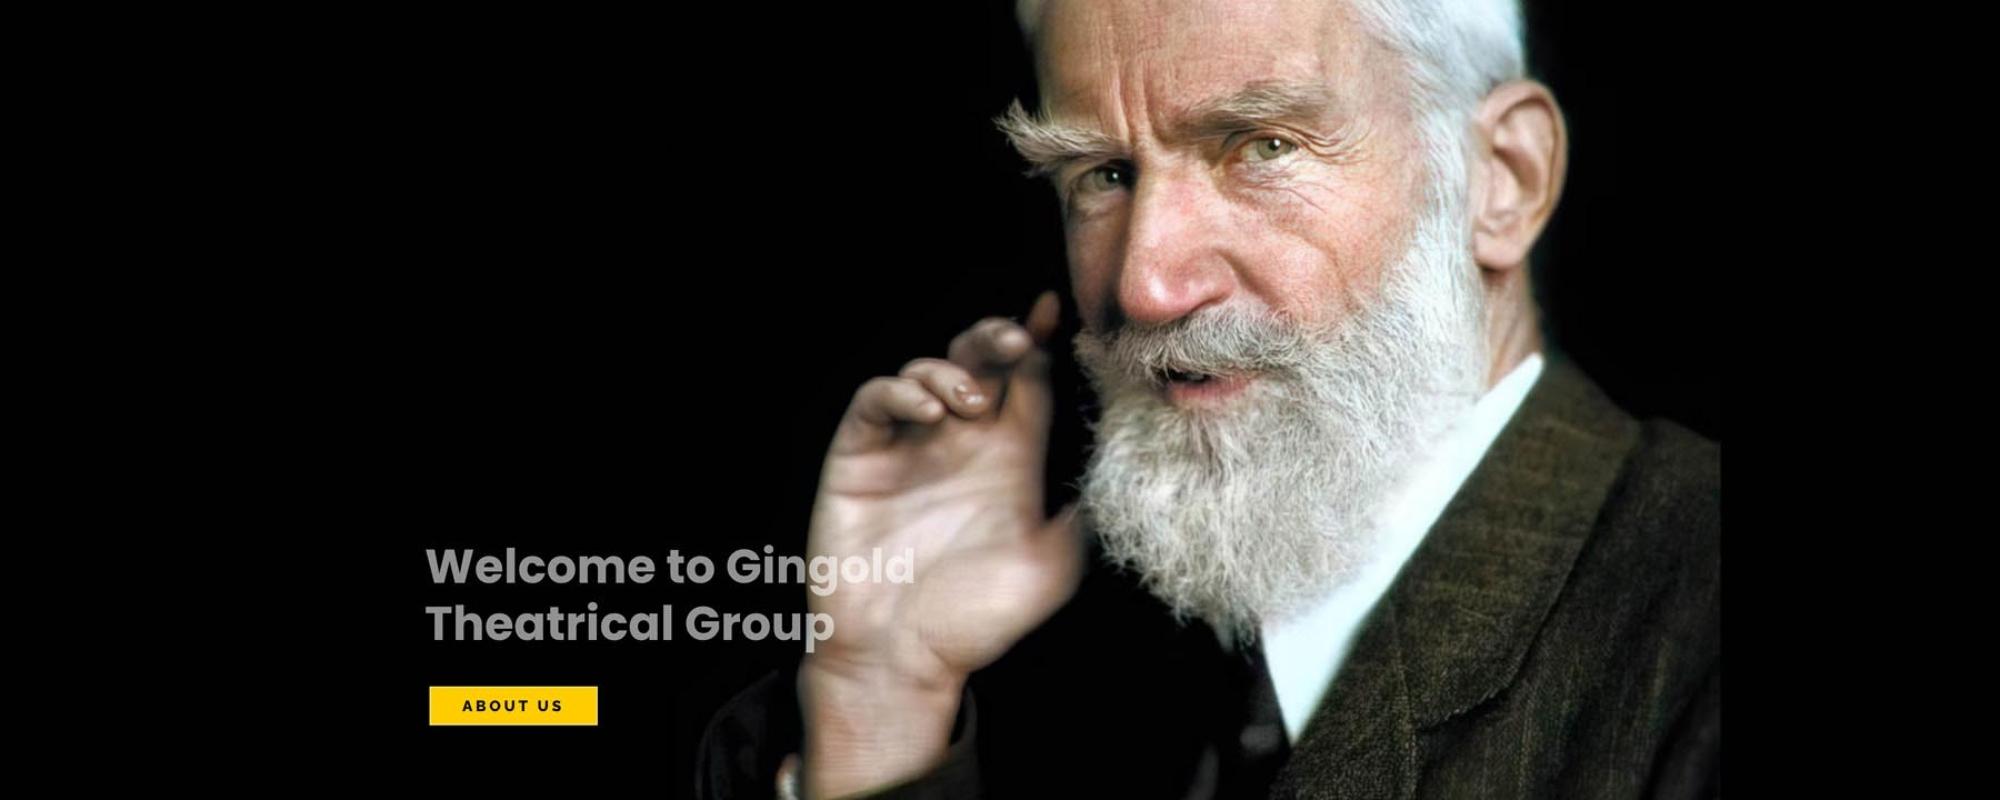 Gingold new slideri2